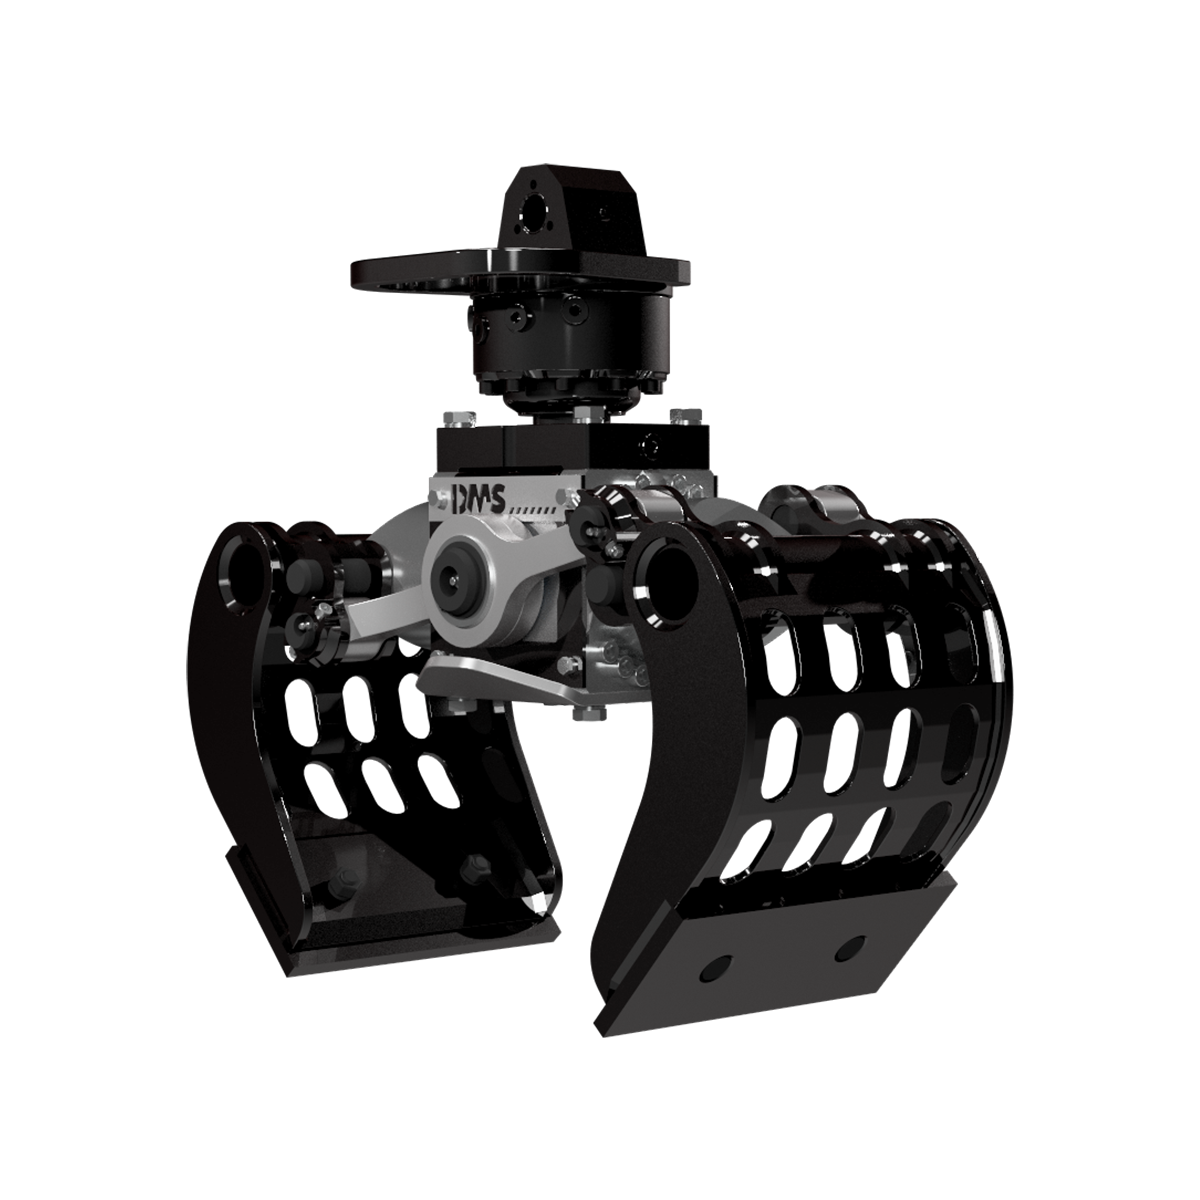 Ladekran Abbruchgreifer AG2030p von DMS Technologie